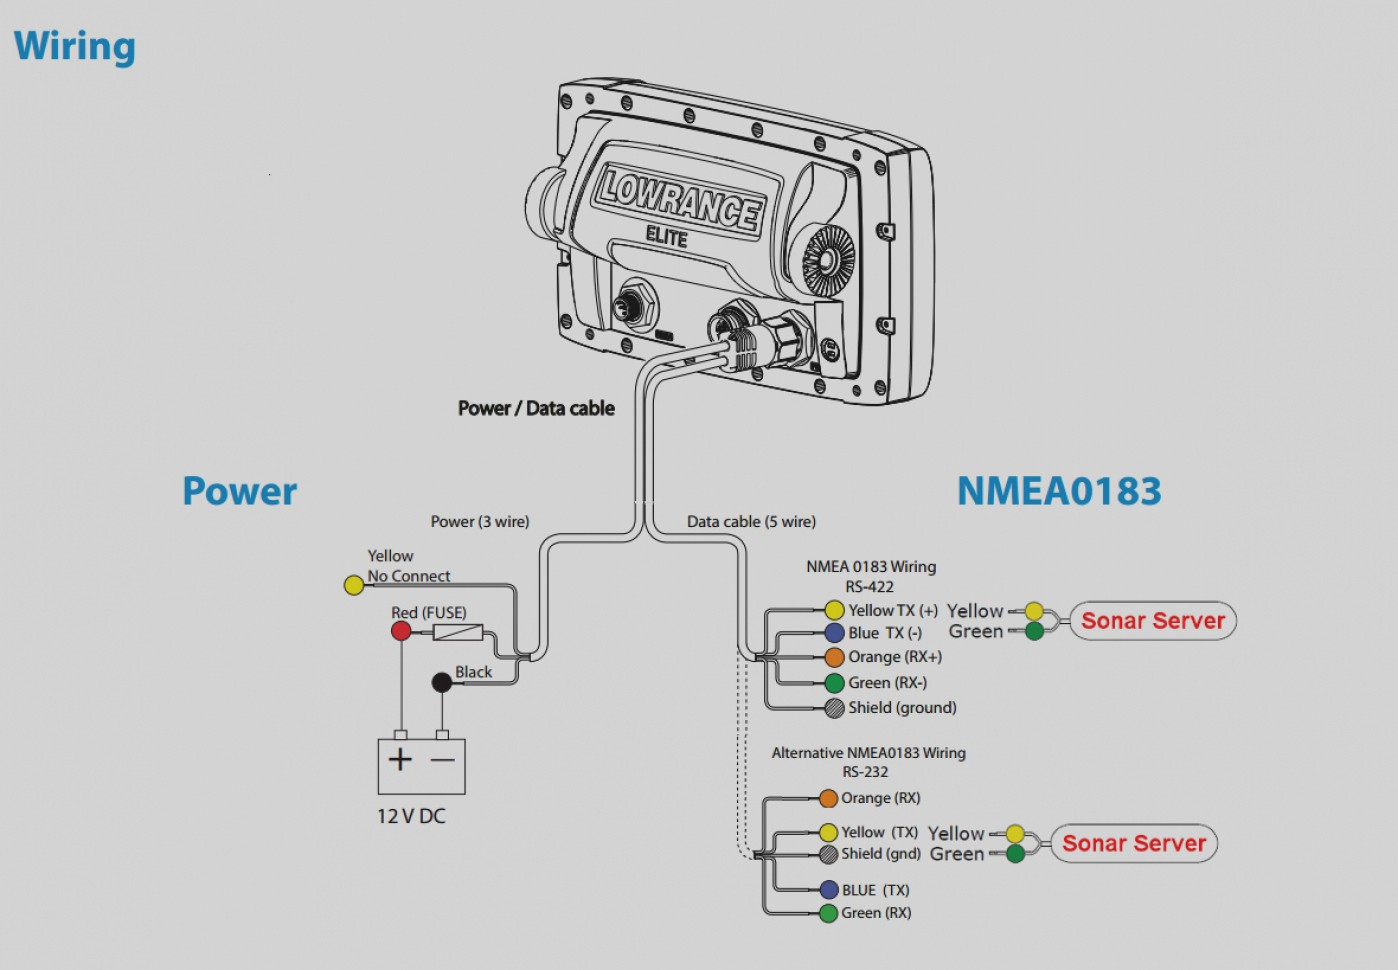 Wiring Diagram Garmin | Wiring Diagram on